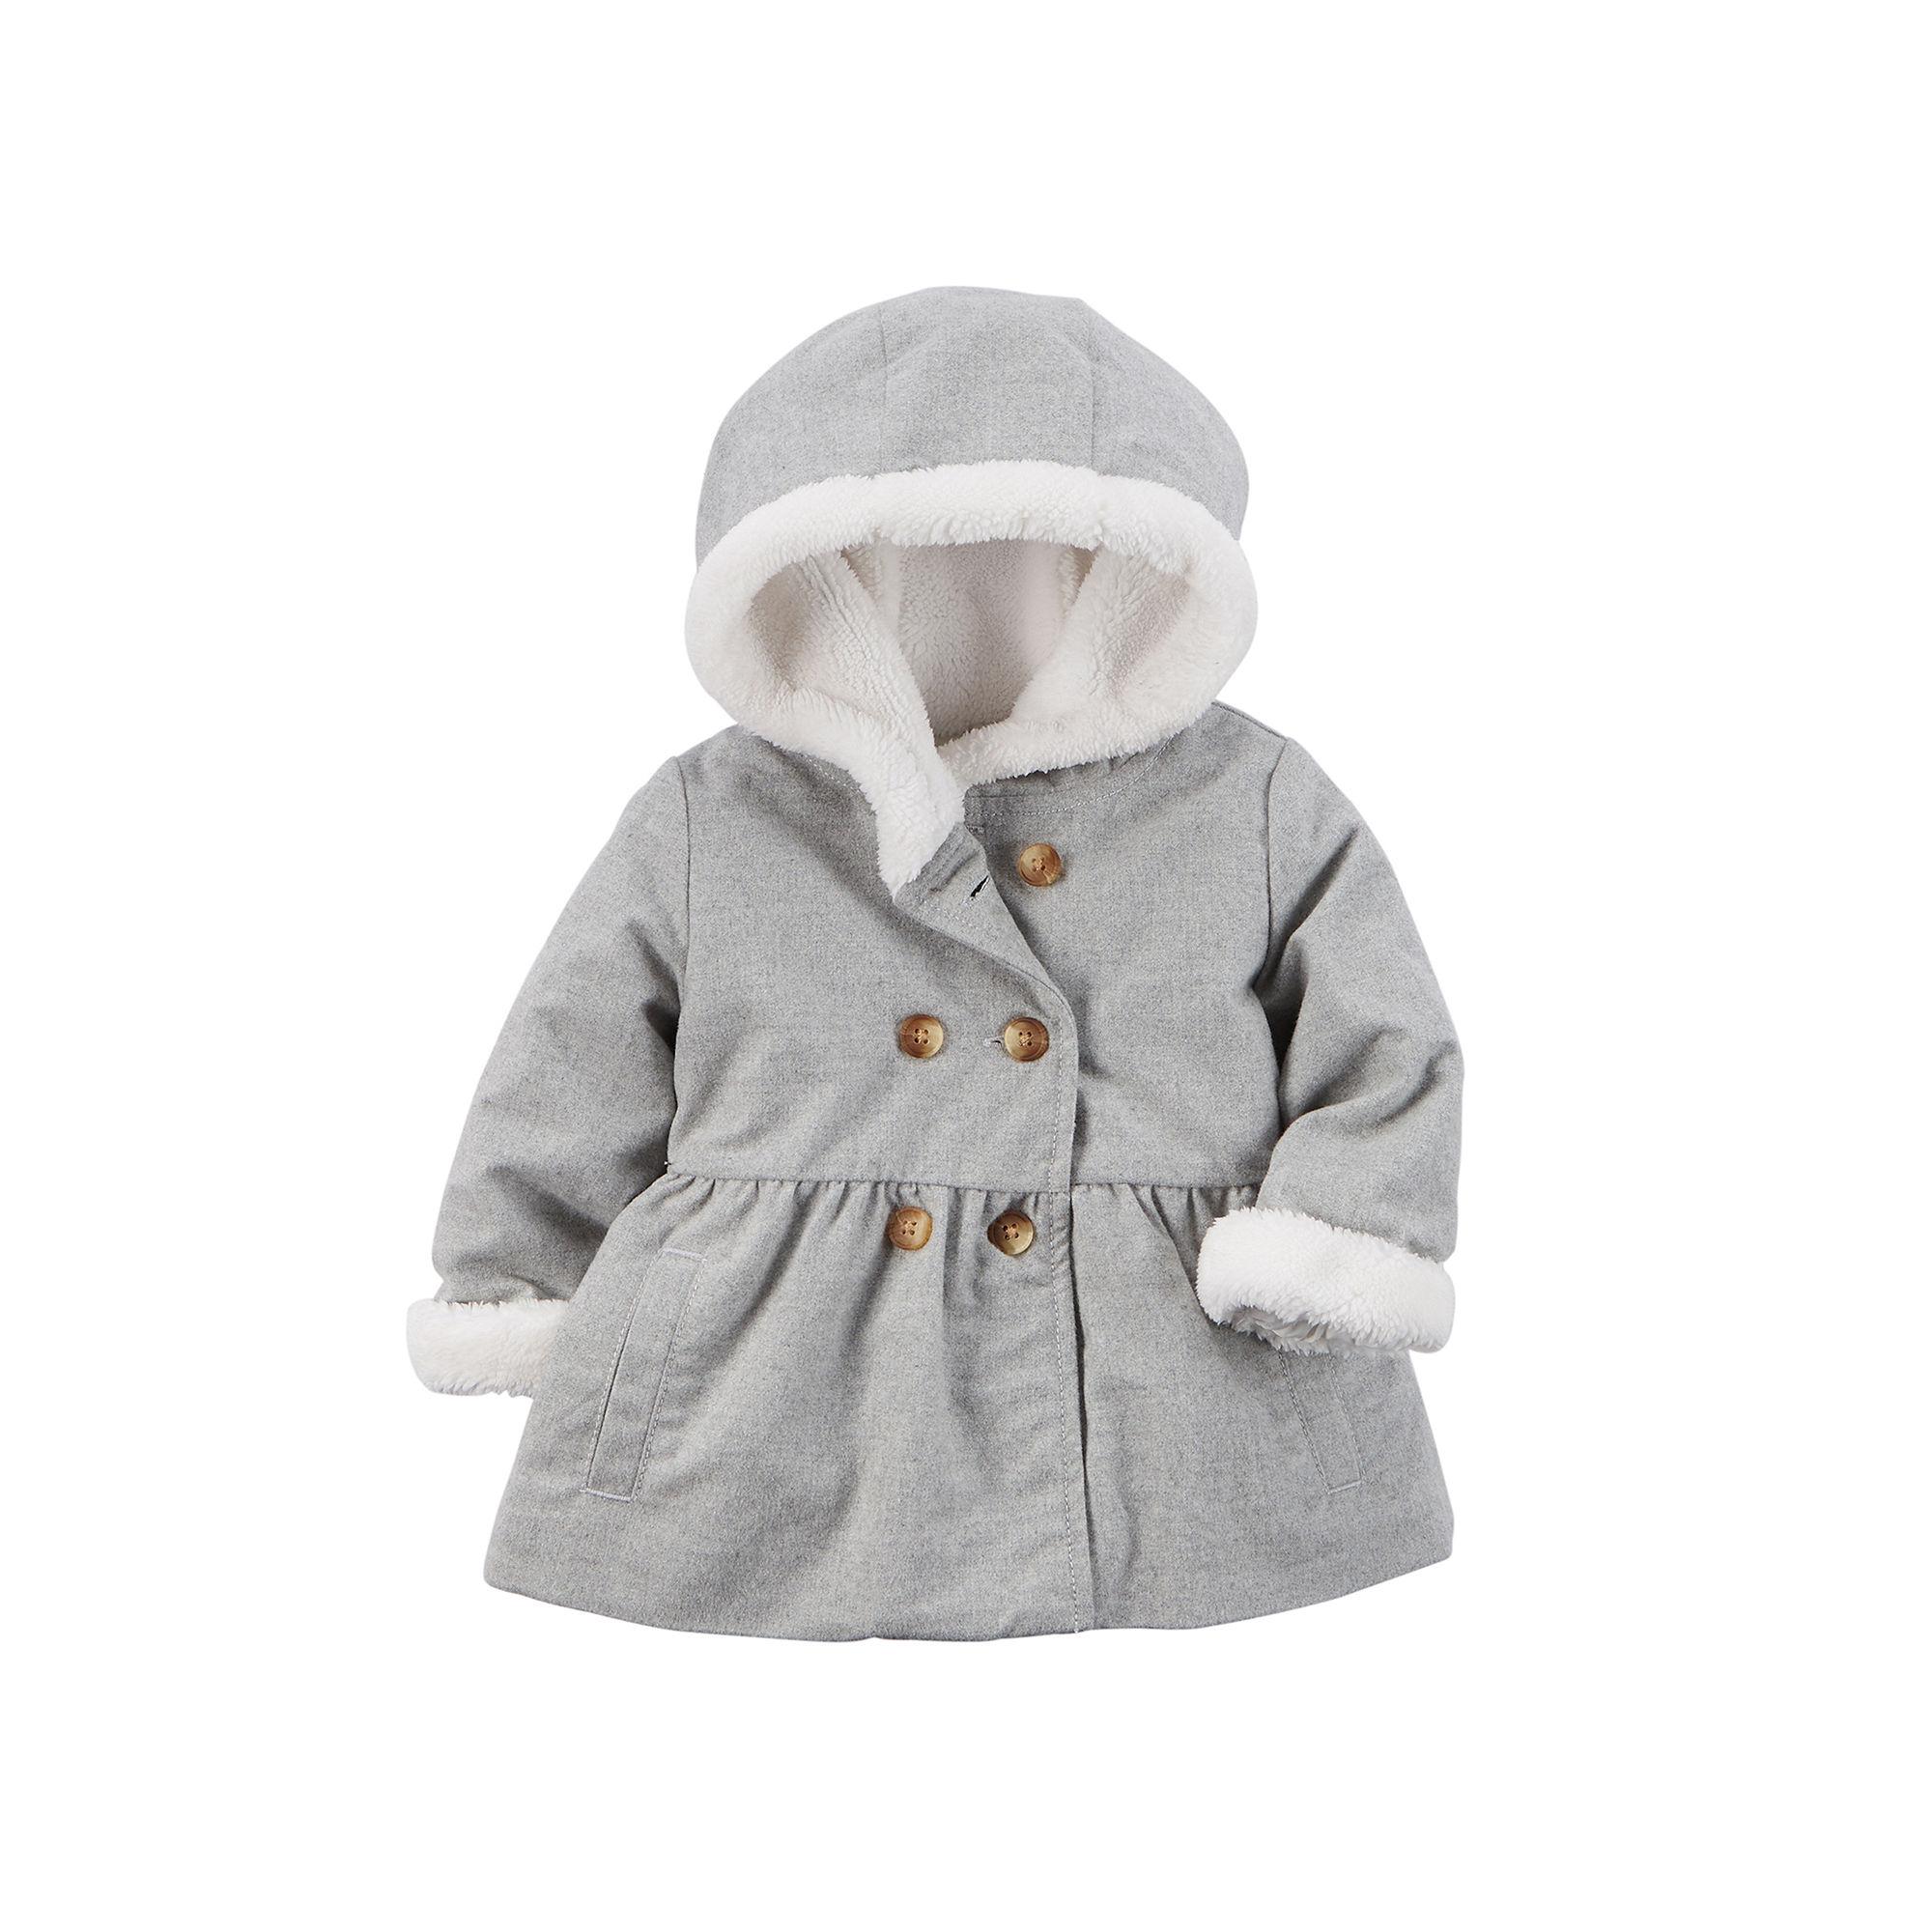 5d70b24b61b9 UPC 888510966166 - Carter s Sherpa-Lined Jacket - Baby Girls newborn ...